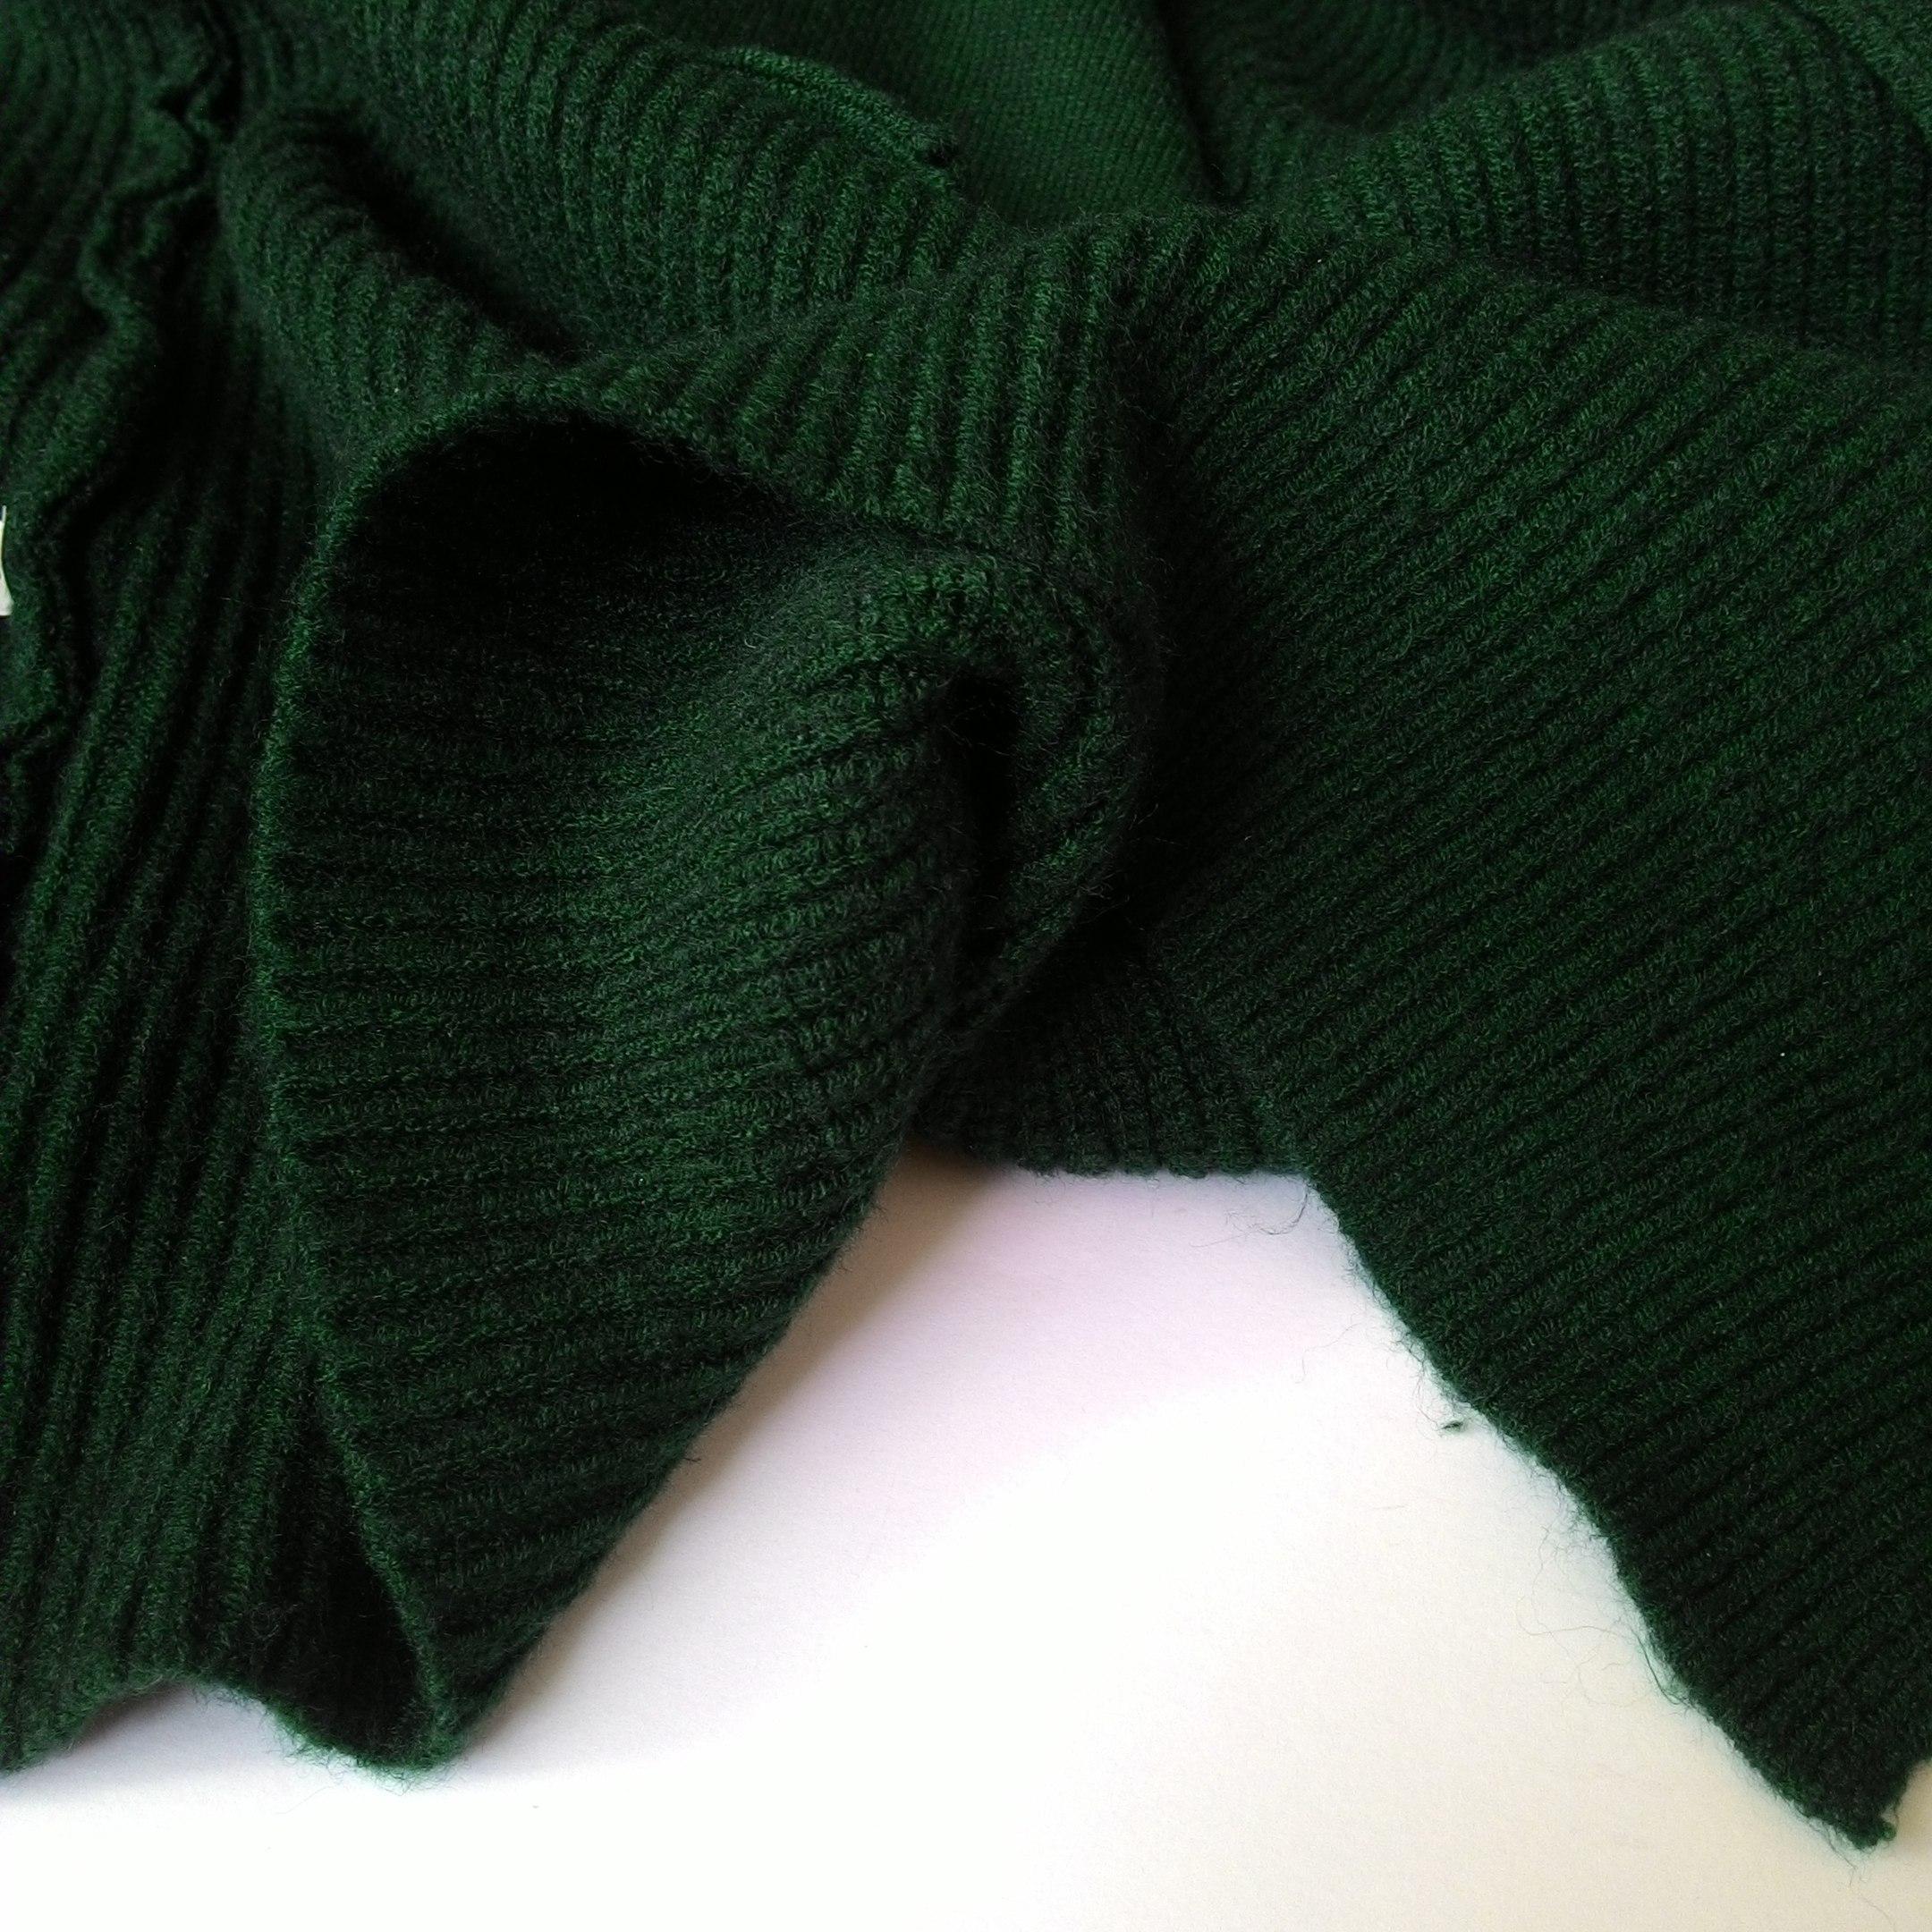 Мягчайший кардиган темно-зеленого цвета из магазина Sishot Store